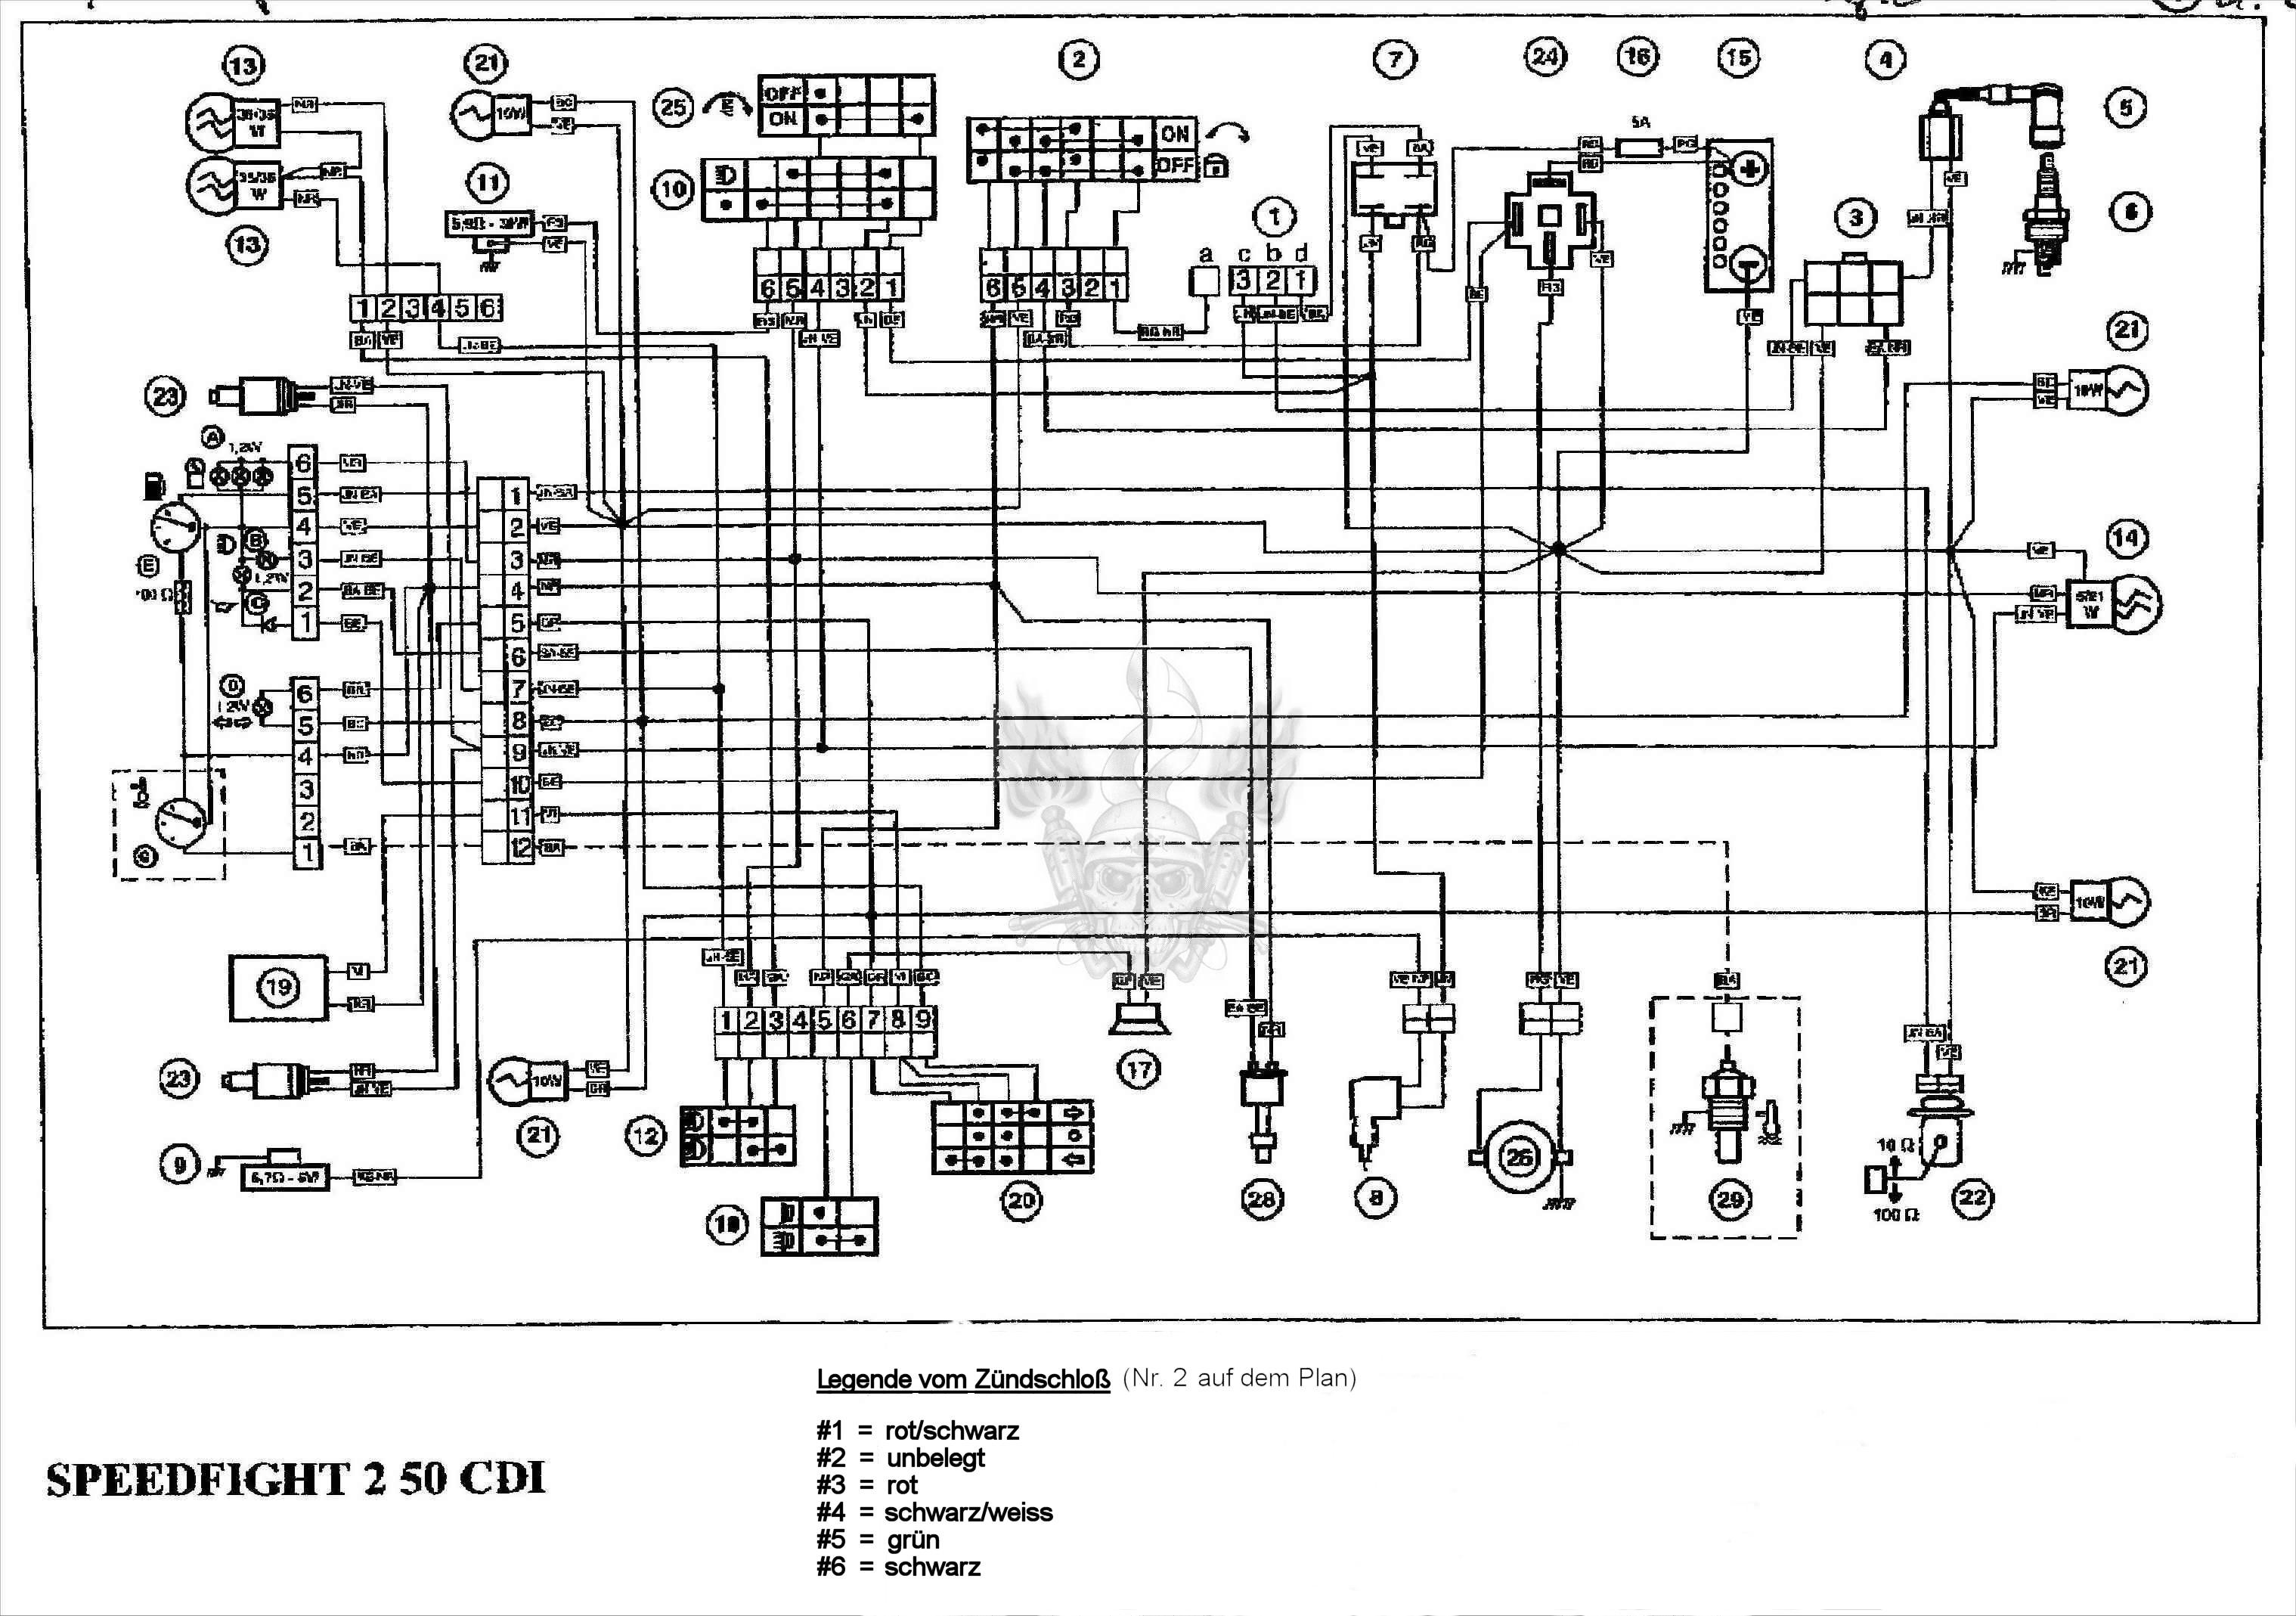 PEUGEOT - Motorcycles Manual PDF, Wiring Diagram & Fault CodesMotorcycle Manuals News